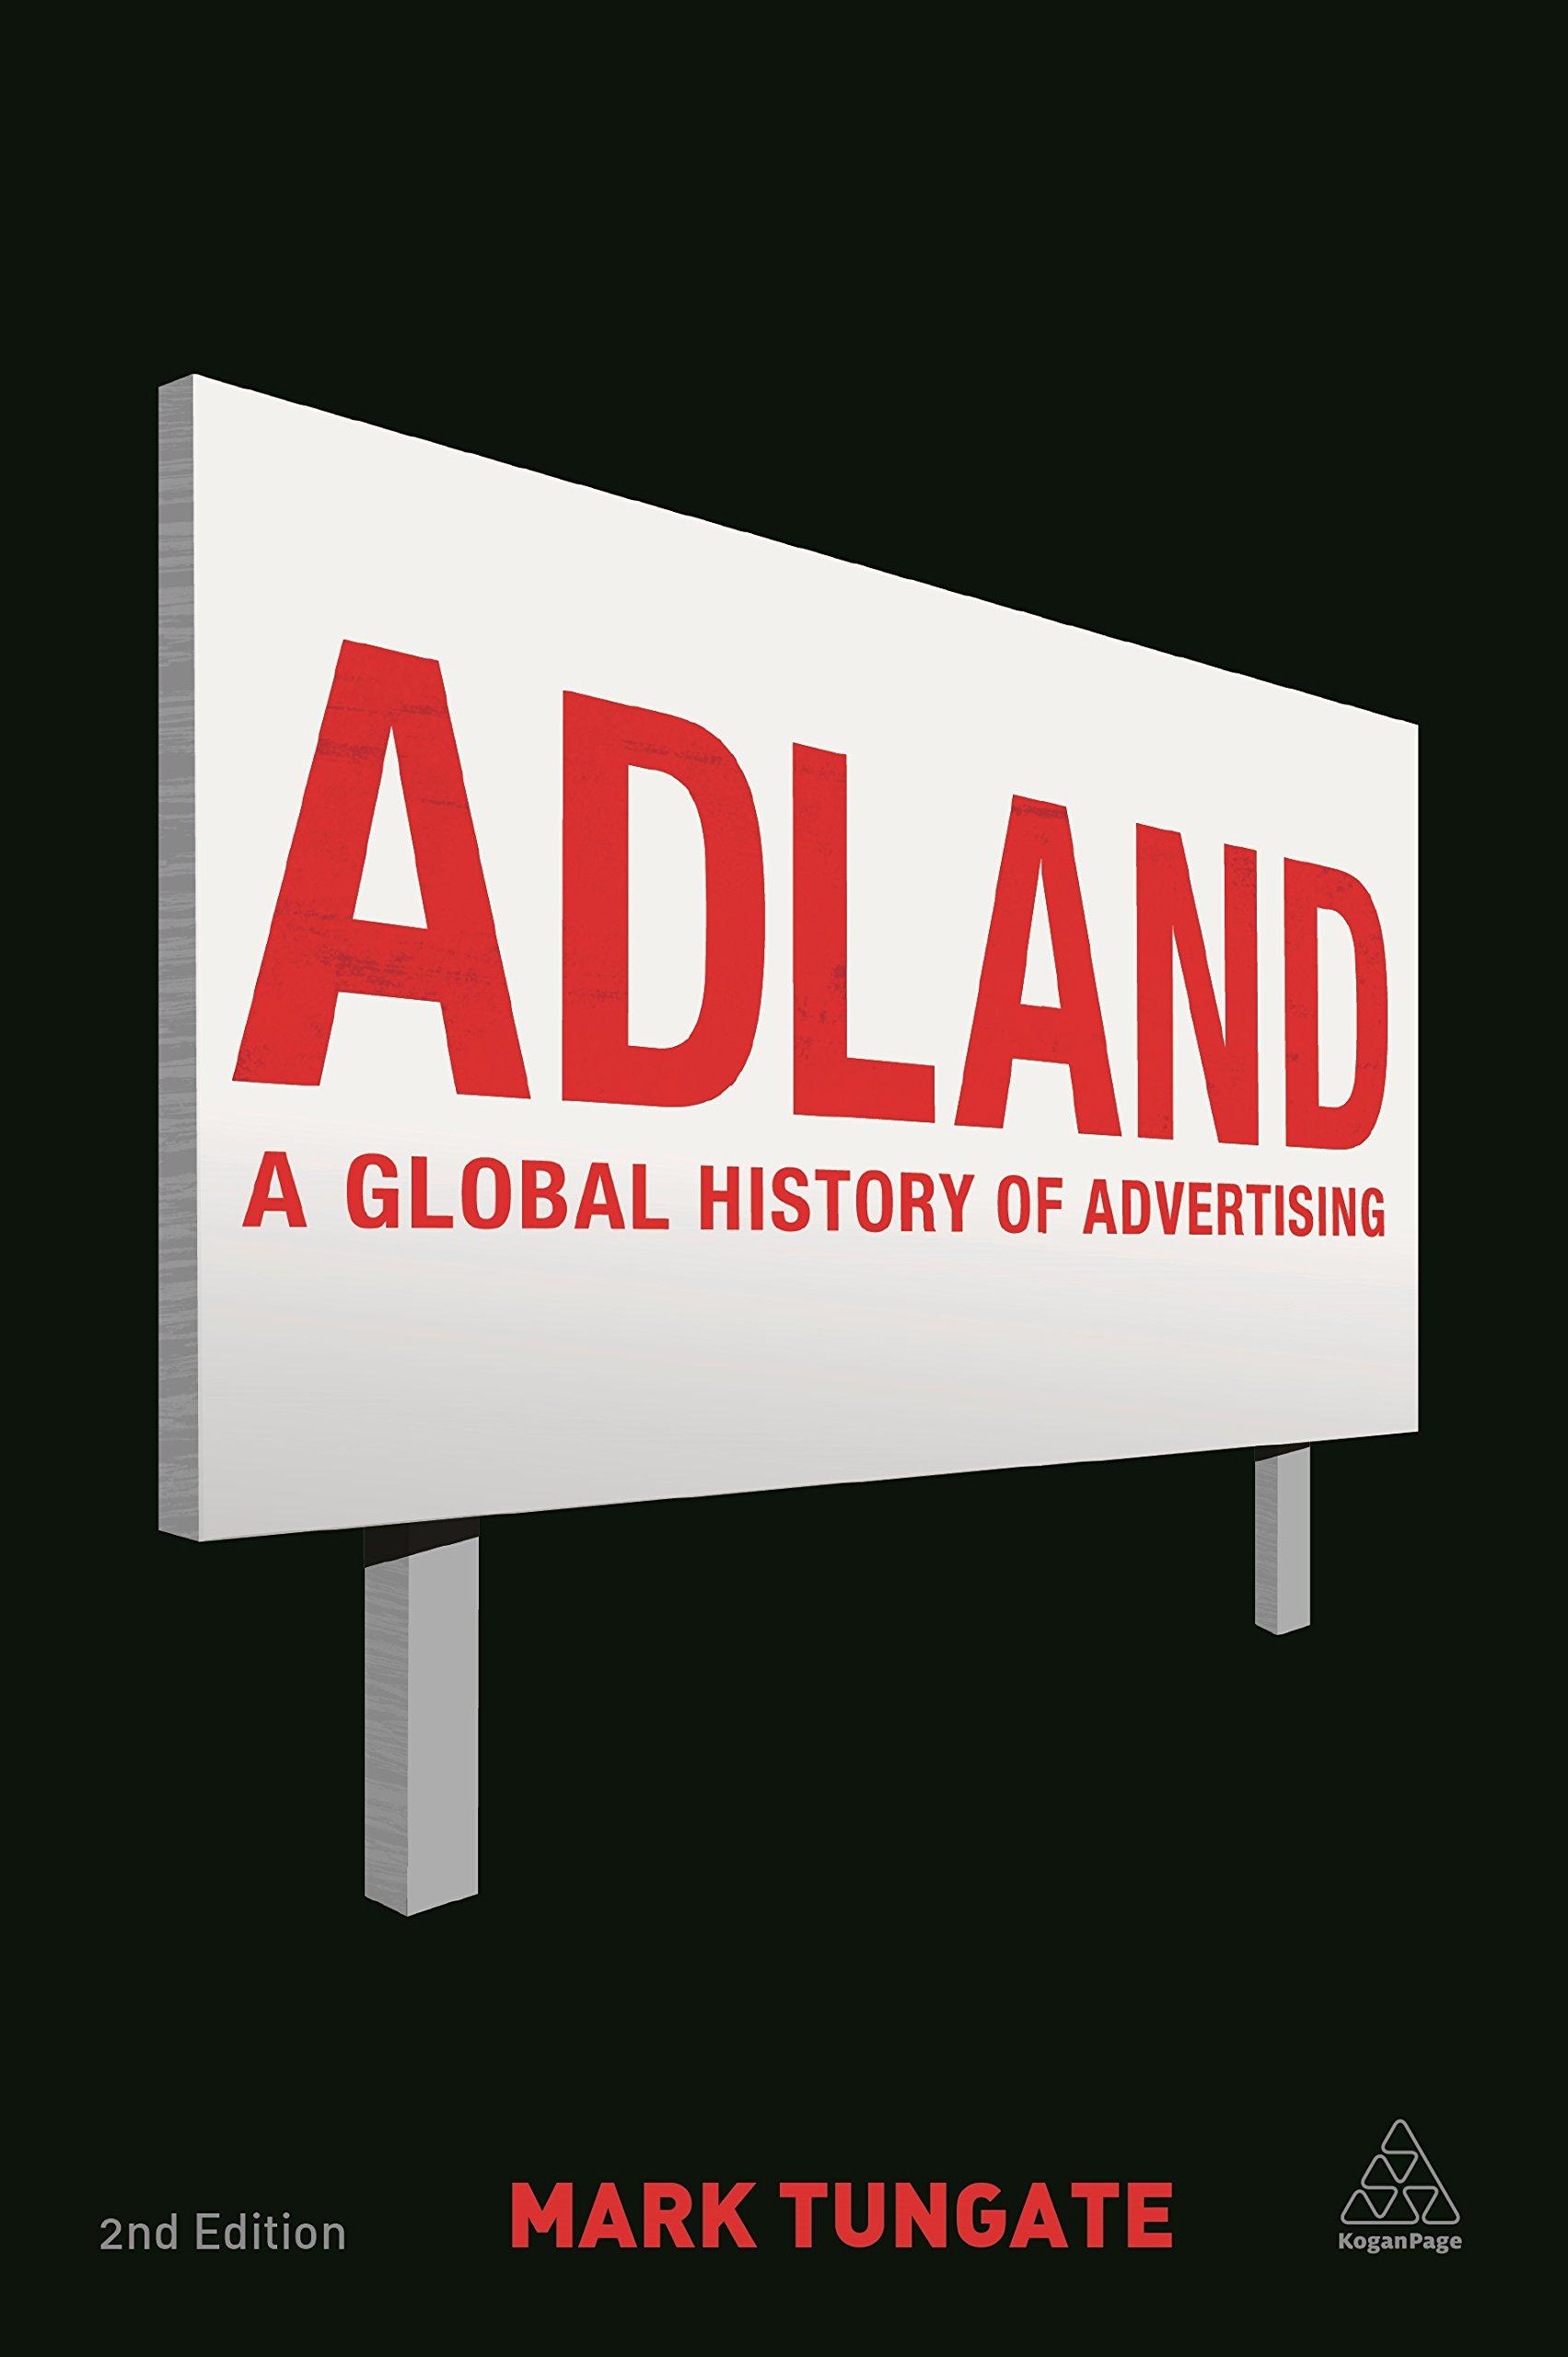 Adland: A Global History of Advertising: Amazon.es: Mark Tungate: Libros en  idiomas extranjeros